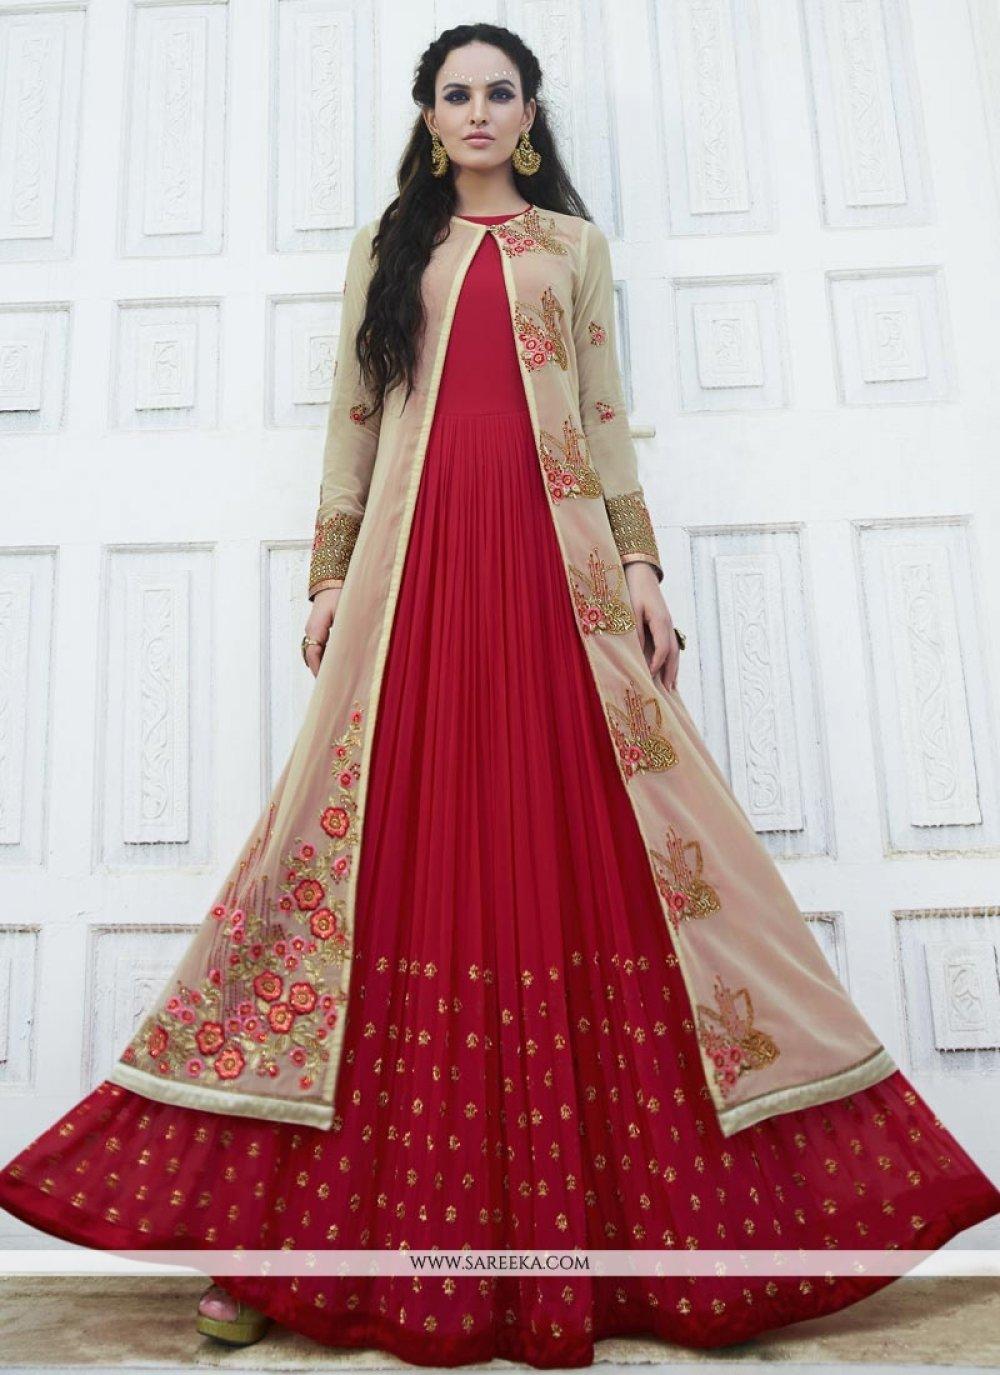 Resham Work Faux Georgette Anarkali Salwar Kameez